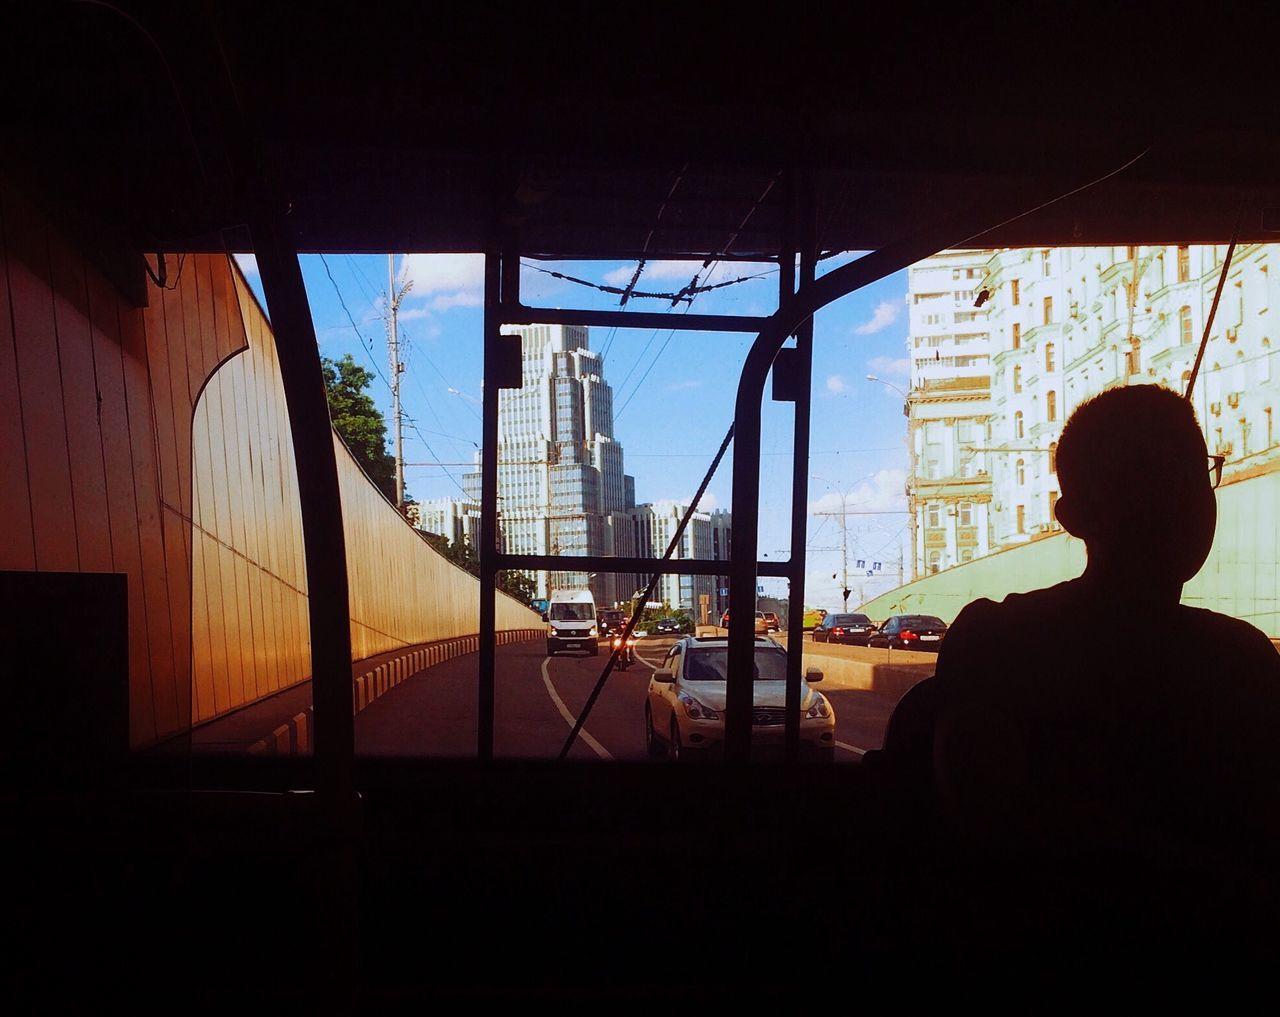 A Frame Within A Frame People Watching Public Transportation Fresh 3 Urban Landscape EyeEm Best Shots - People + Portrait EyeEm Best Shots My Best Photo 2015